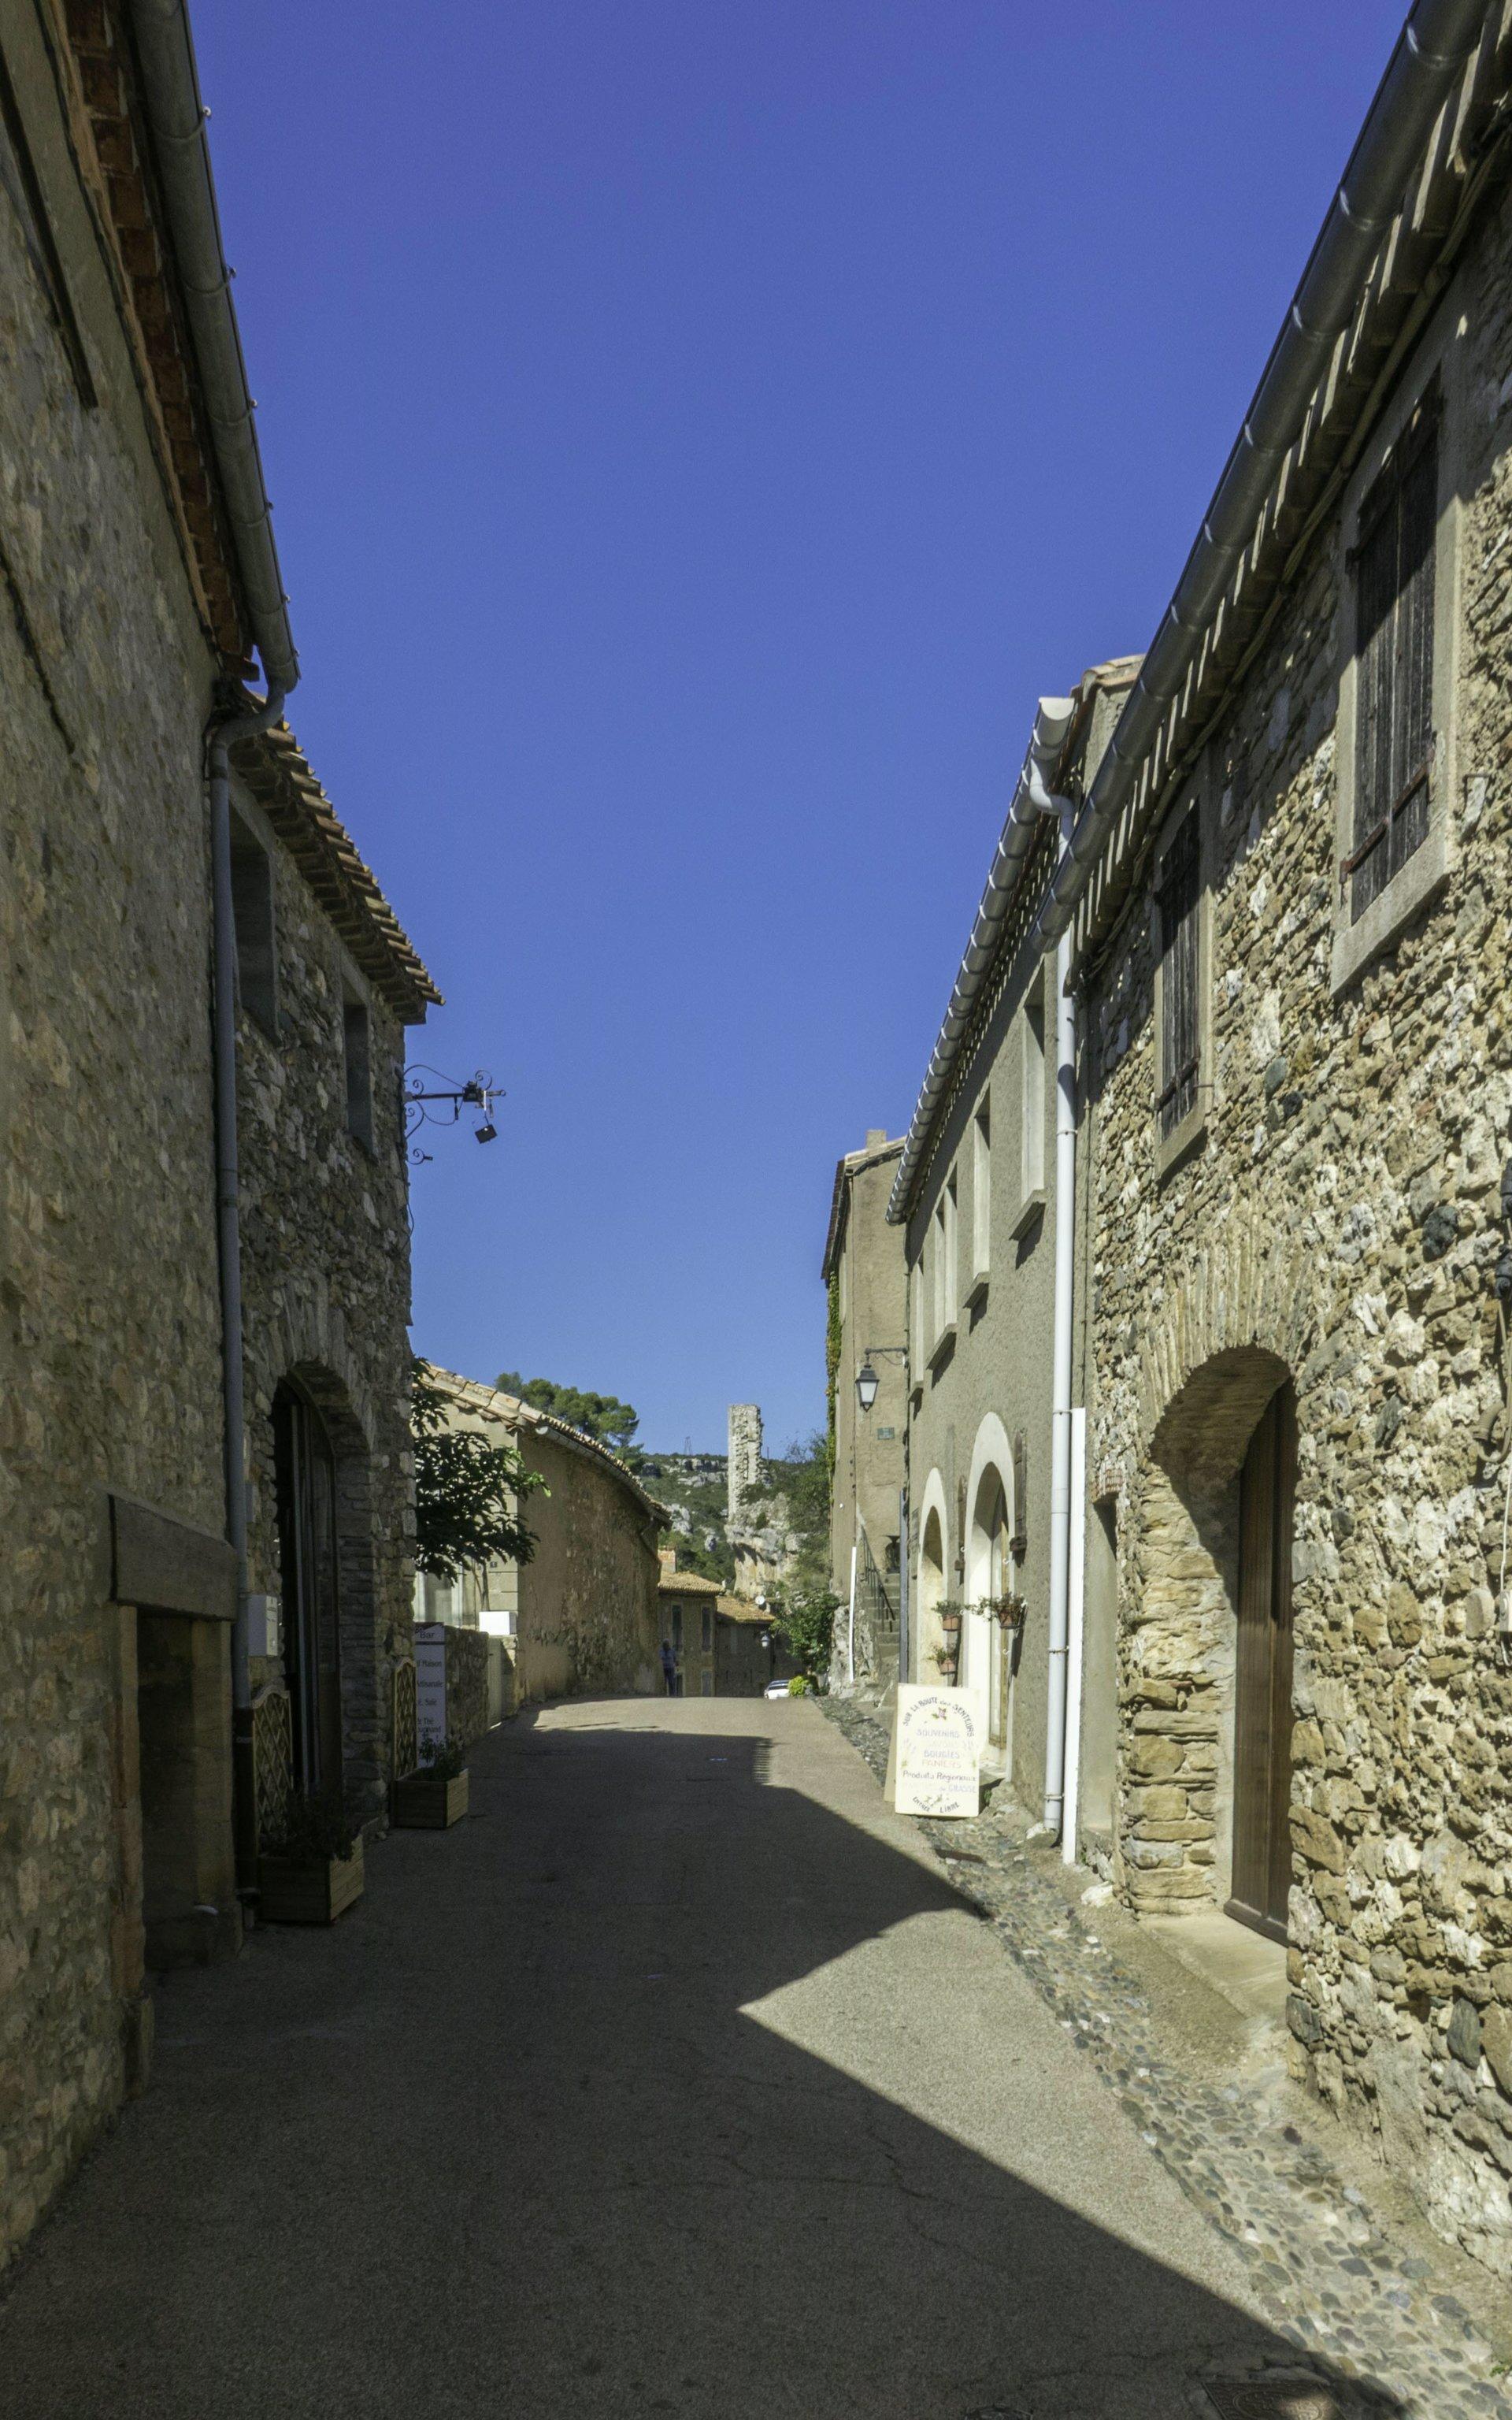 Rue du Porche in Minerve